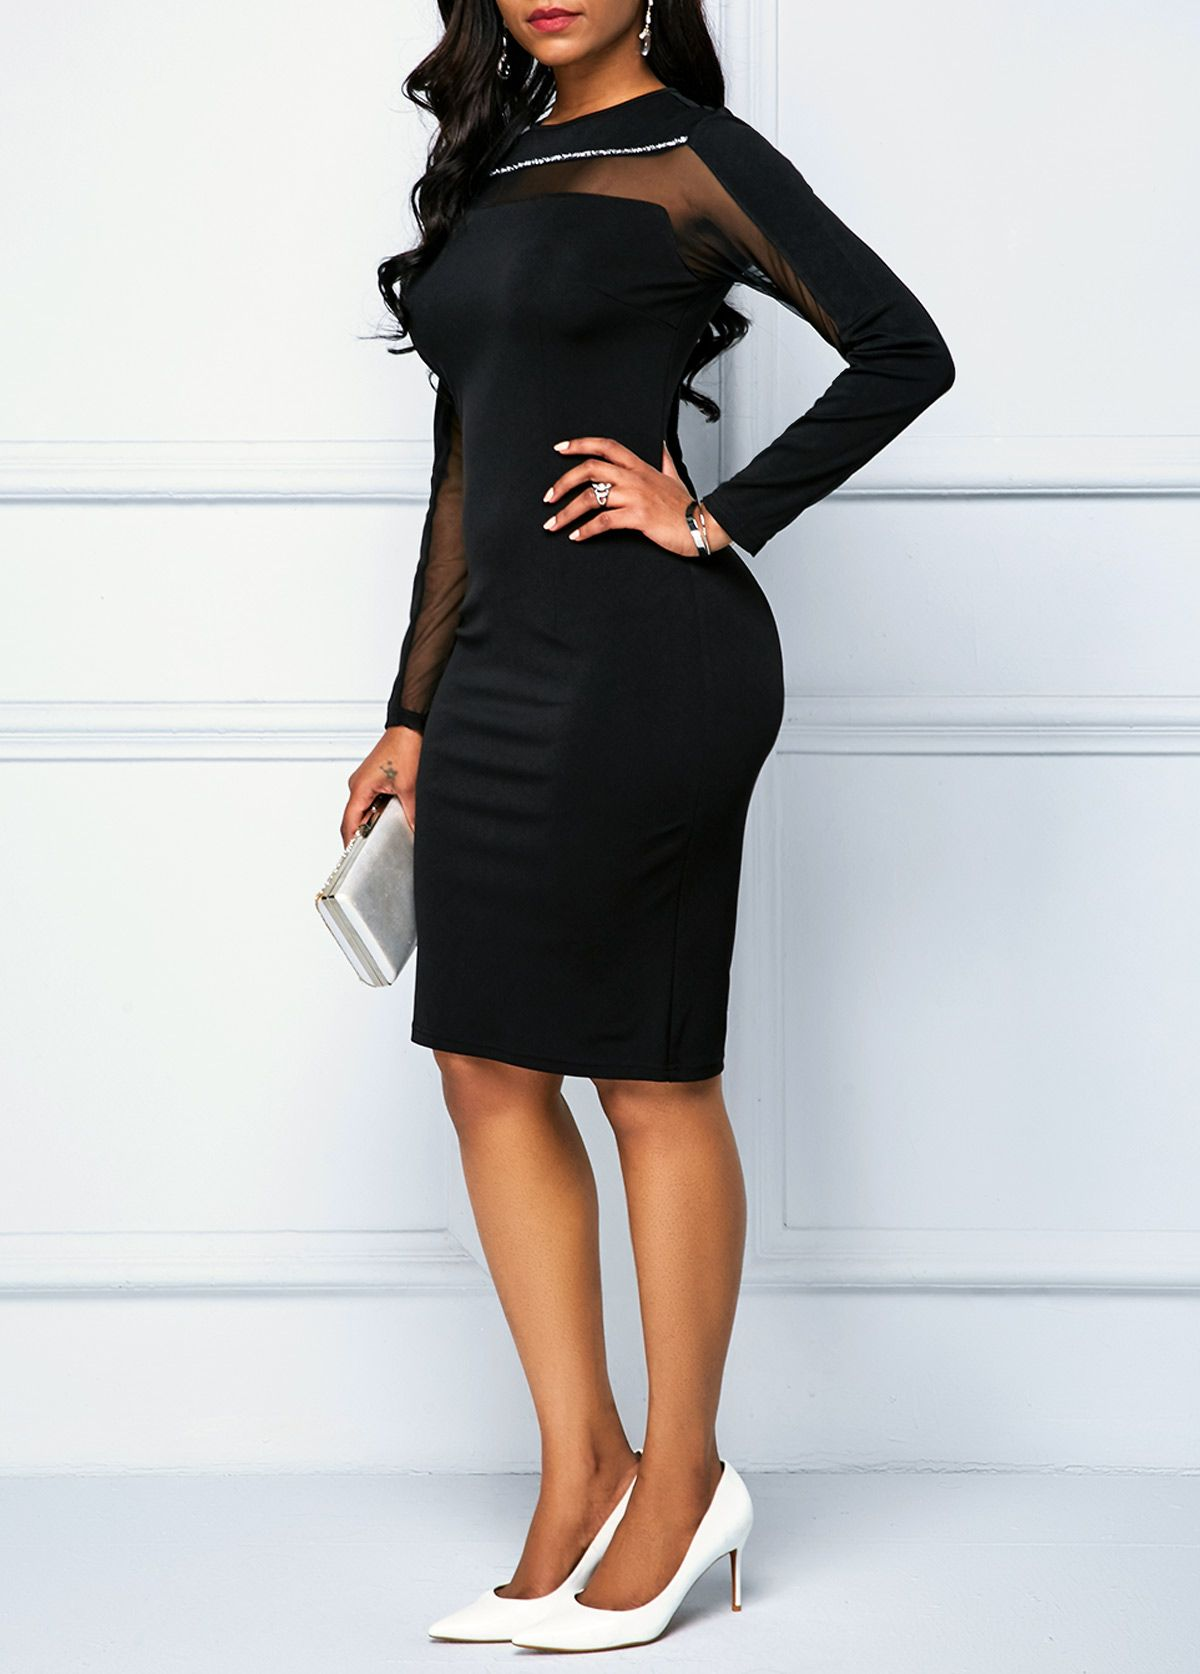 Black Zipper Back Long Sleeve Sheath Dress Rotita Com Usd 30 36 Shop Casual Dresses Long Sleeve Sheath Dress Dresses [ 1674 x 1200 Pixel ]